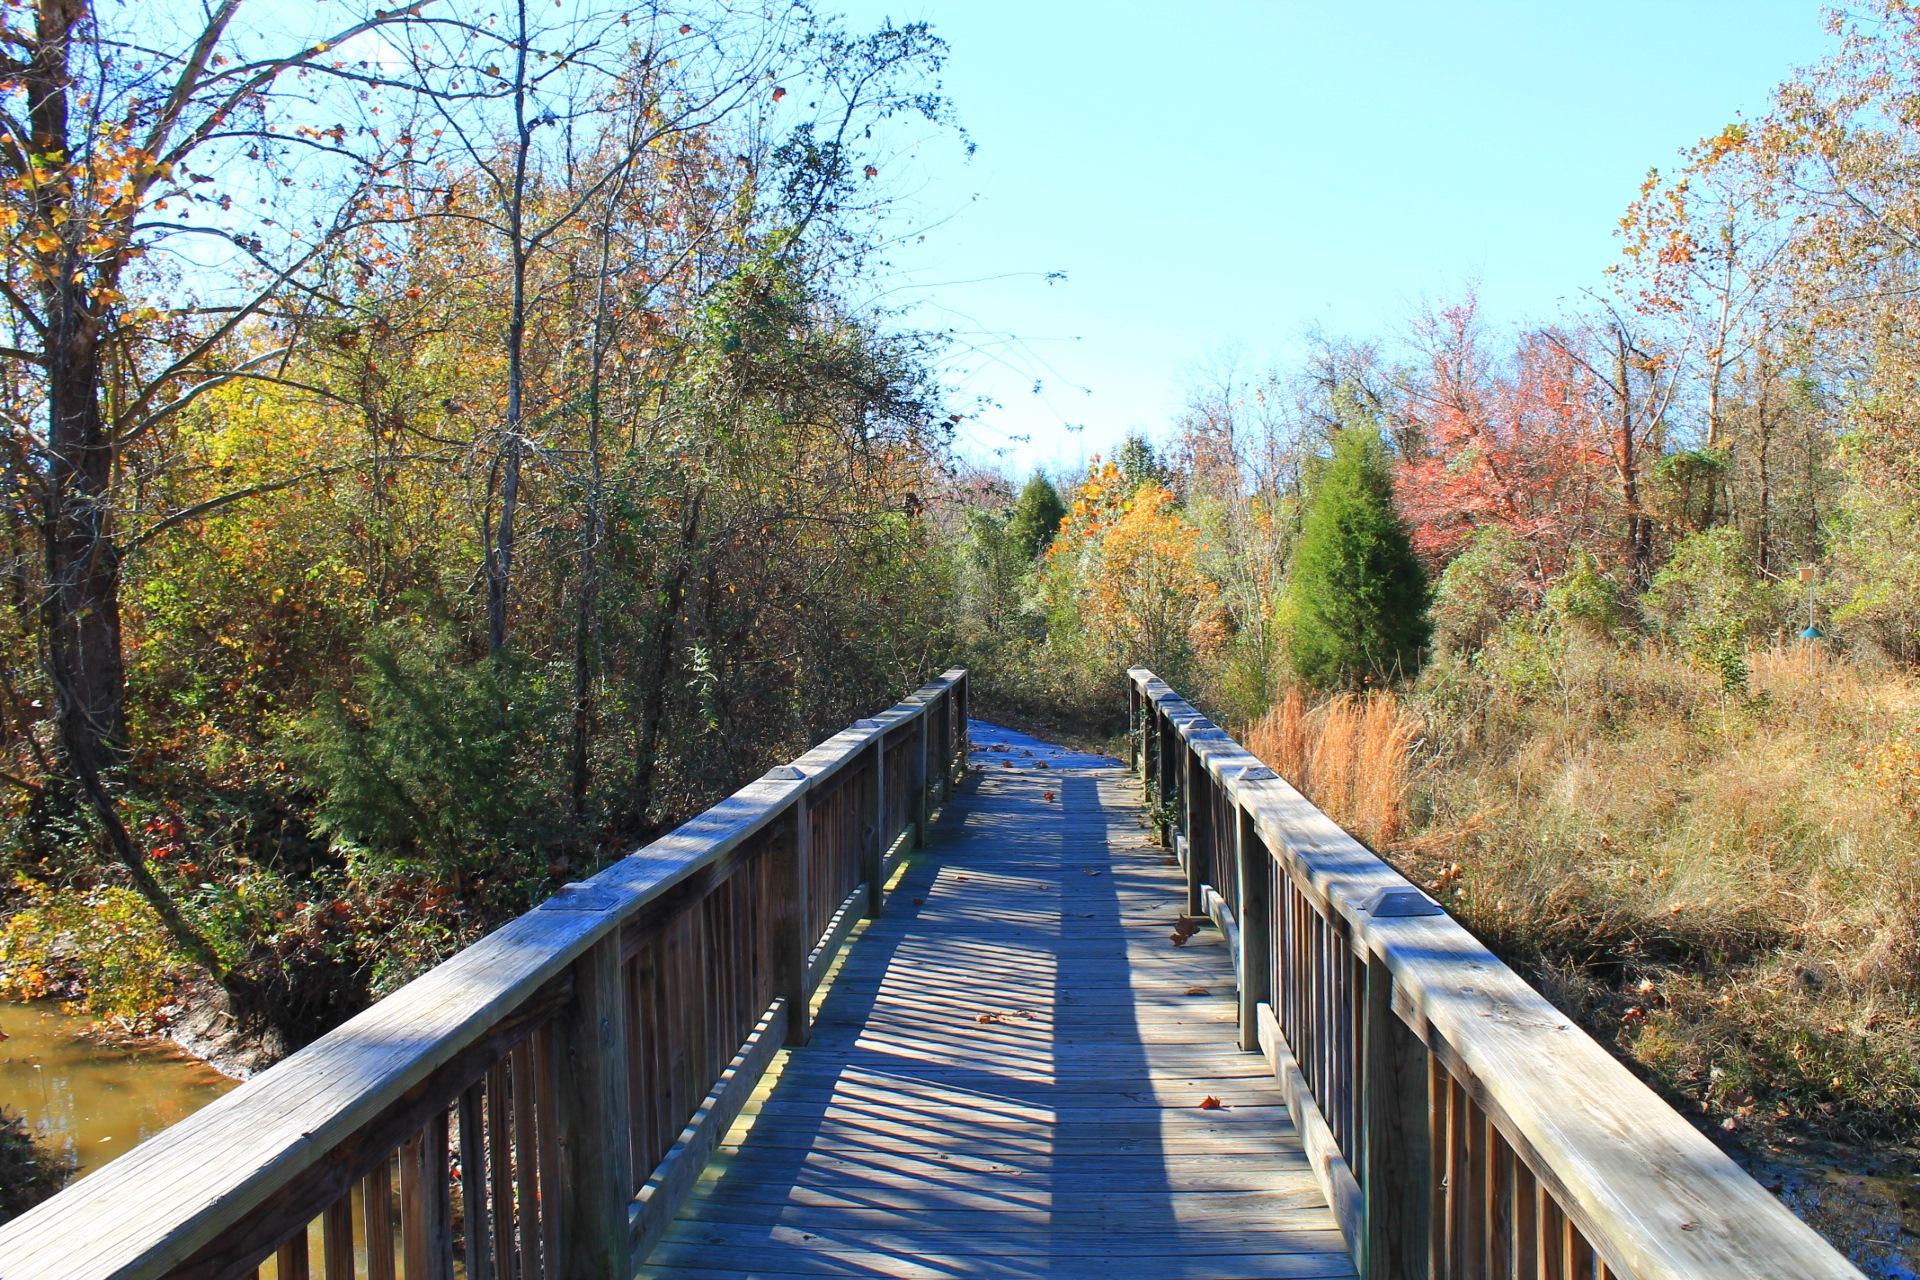 Huckabee Nature Center Trails